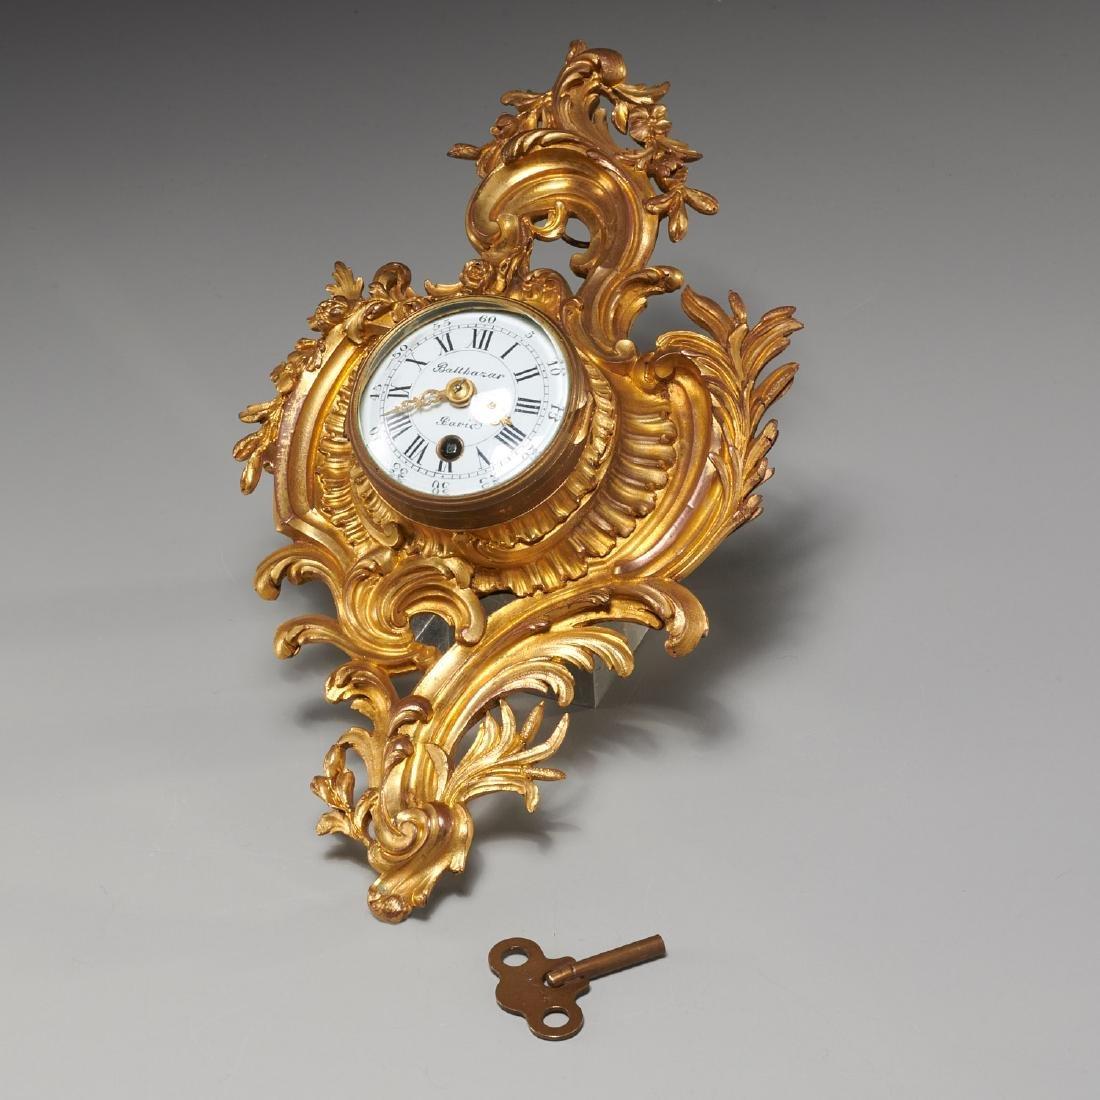 French cartel clock signed Balthazar, Paris